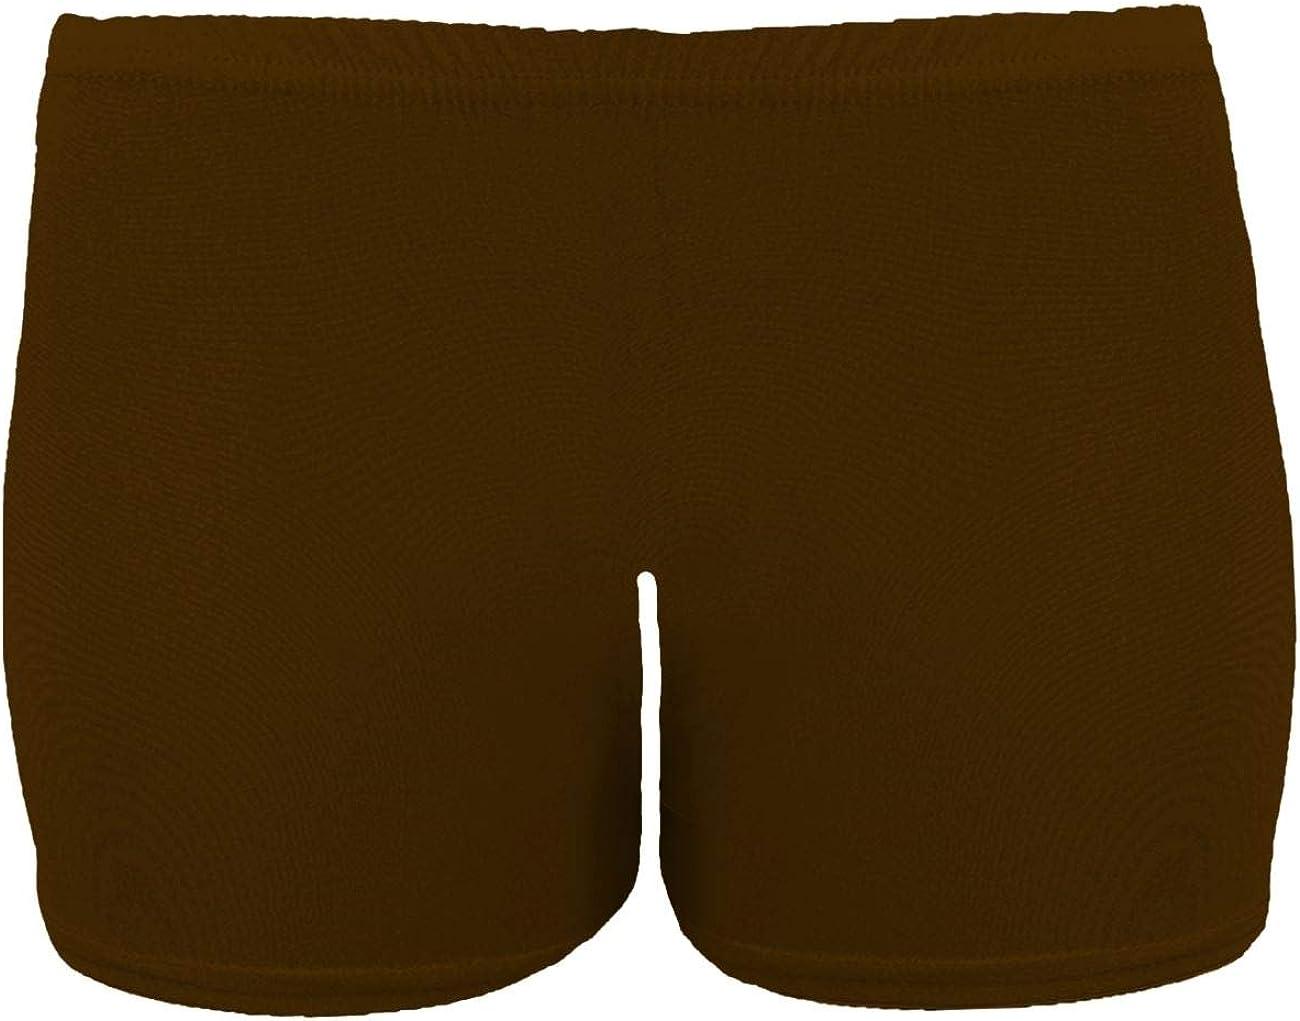 janisramone Girls Kids New Plain Neon Stretchy Gymnastics Dance Shorts School Children Party Wear Hot Pants 5-13 Years